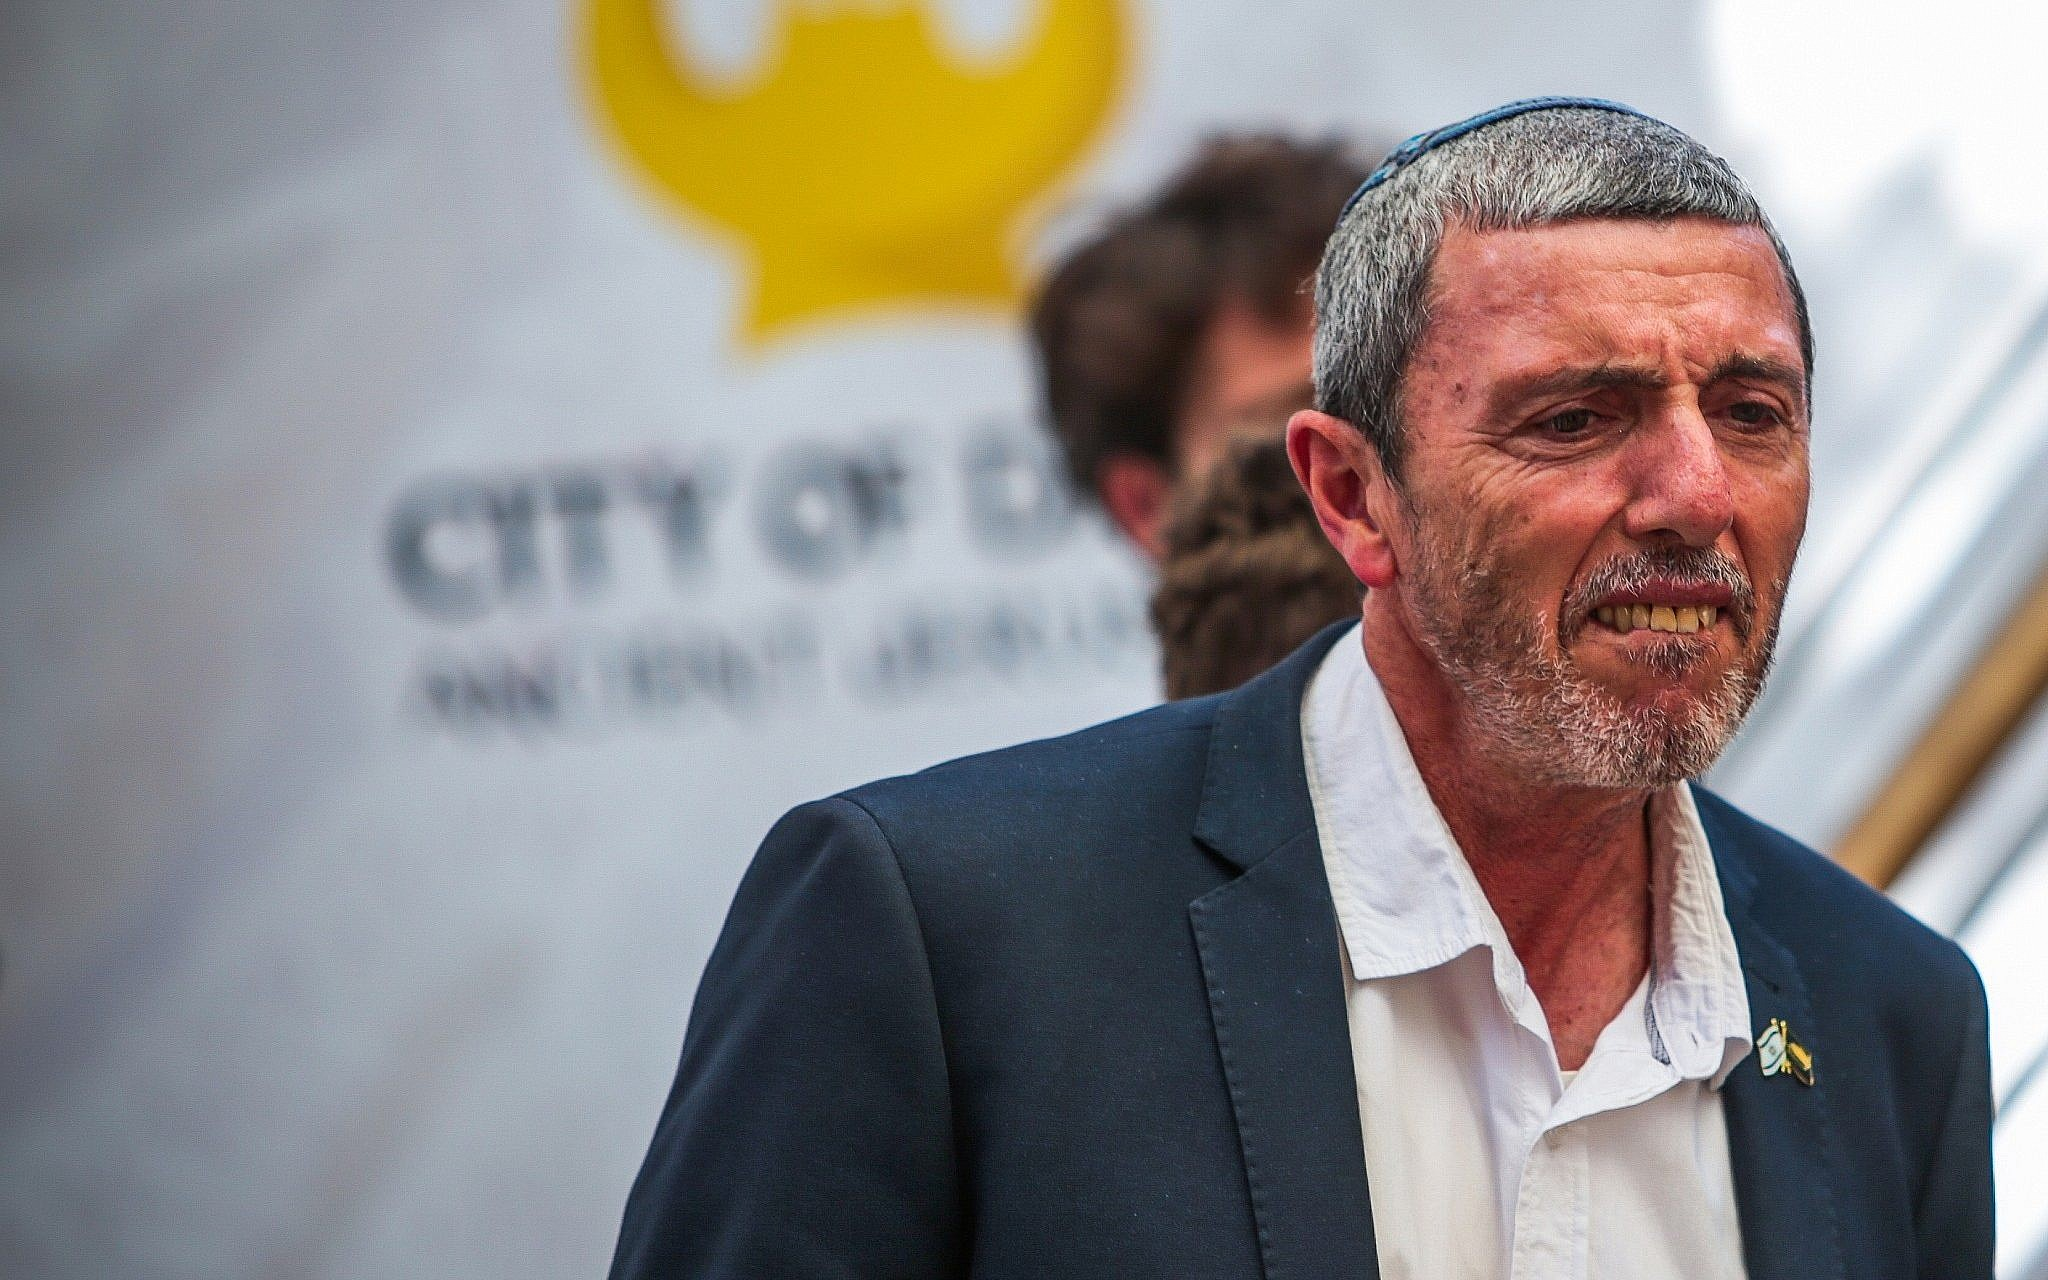 Peretz walks back conversion therapy comment, calls practice